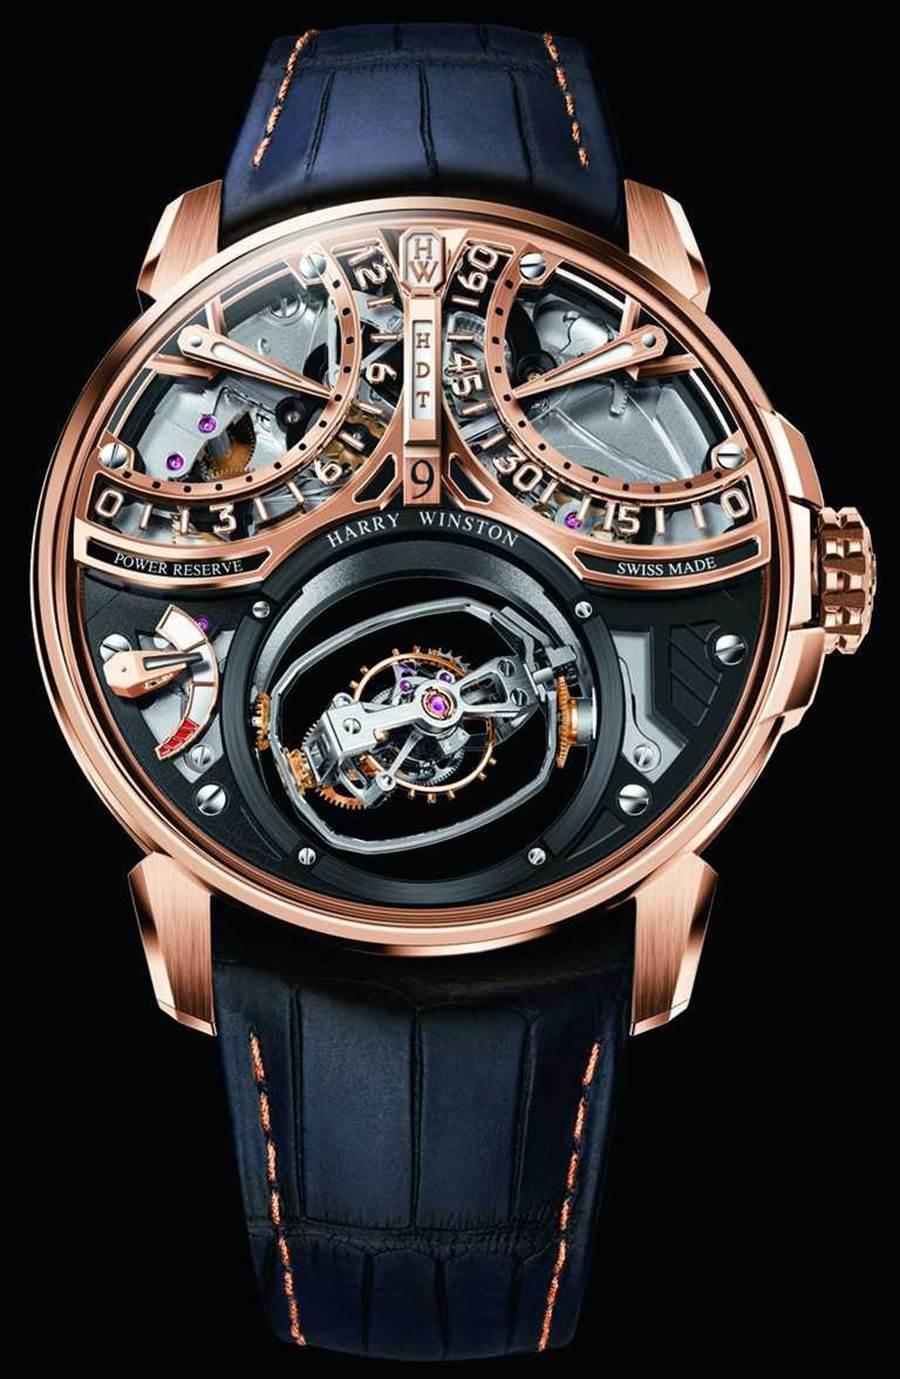 HARRY WINSTON「Histoire de Tourbillon史诗陀飞轮系列」9号腕表,18K玫瑰金表壳,46.5mm,58颗宝石╱20,420,000元。(图╱HARRY WINSTON提供)